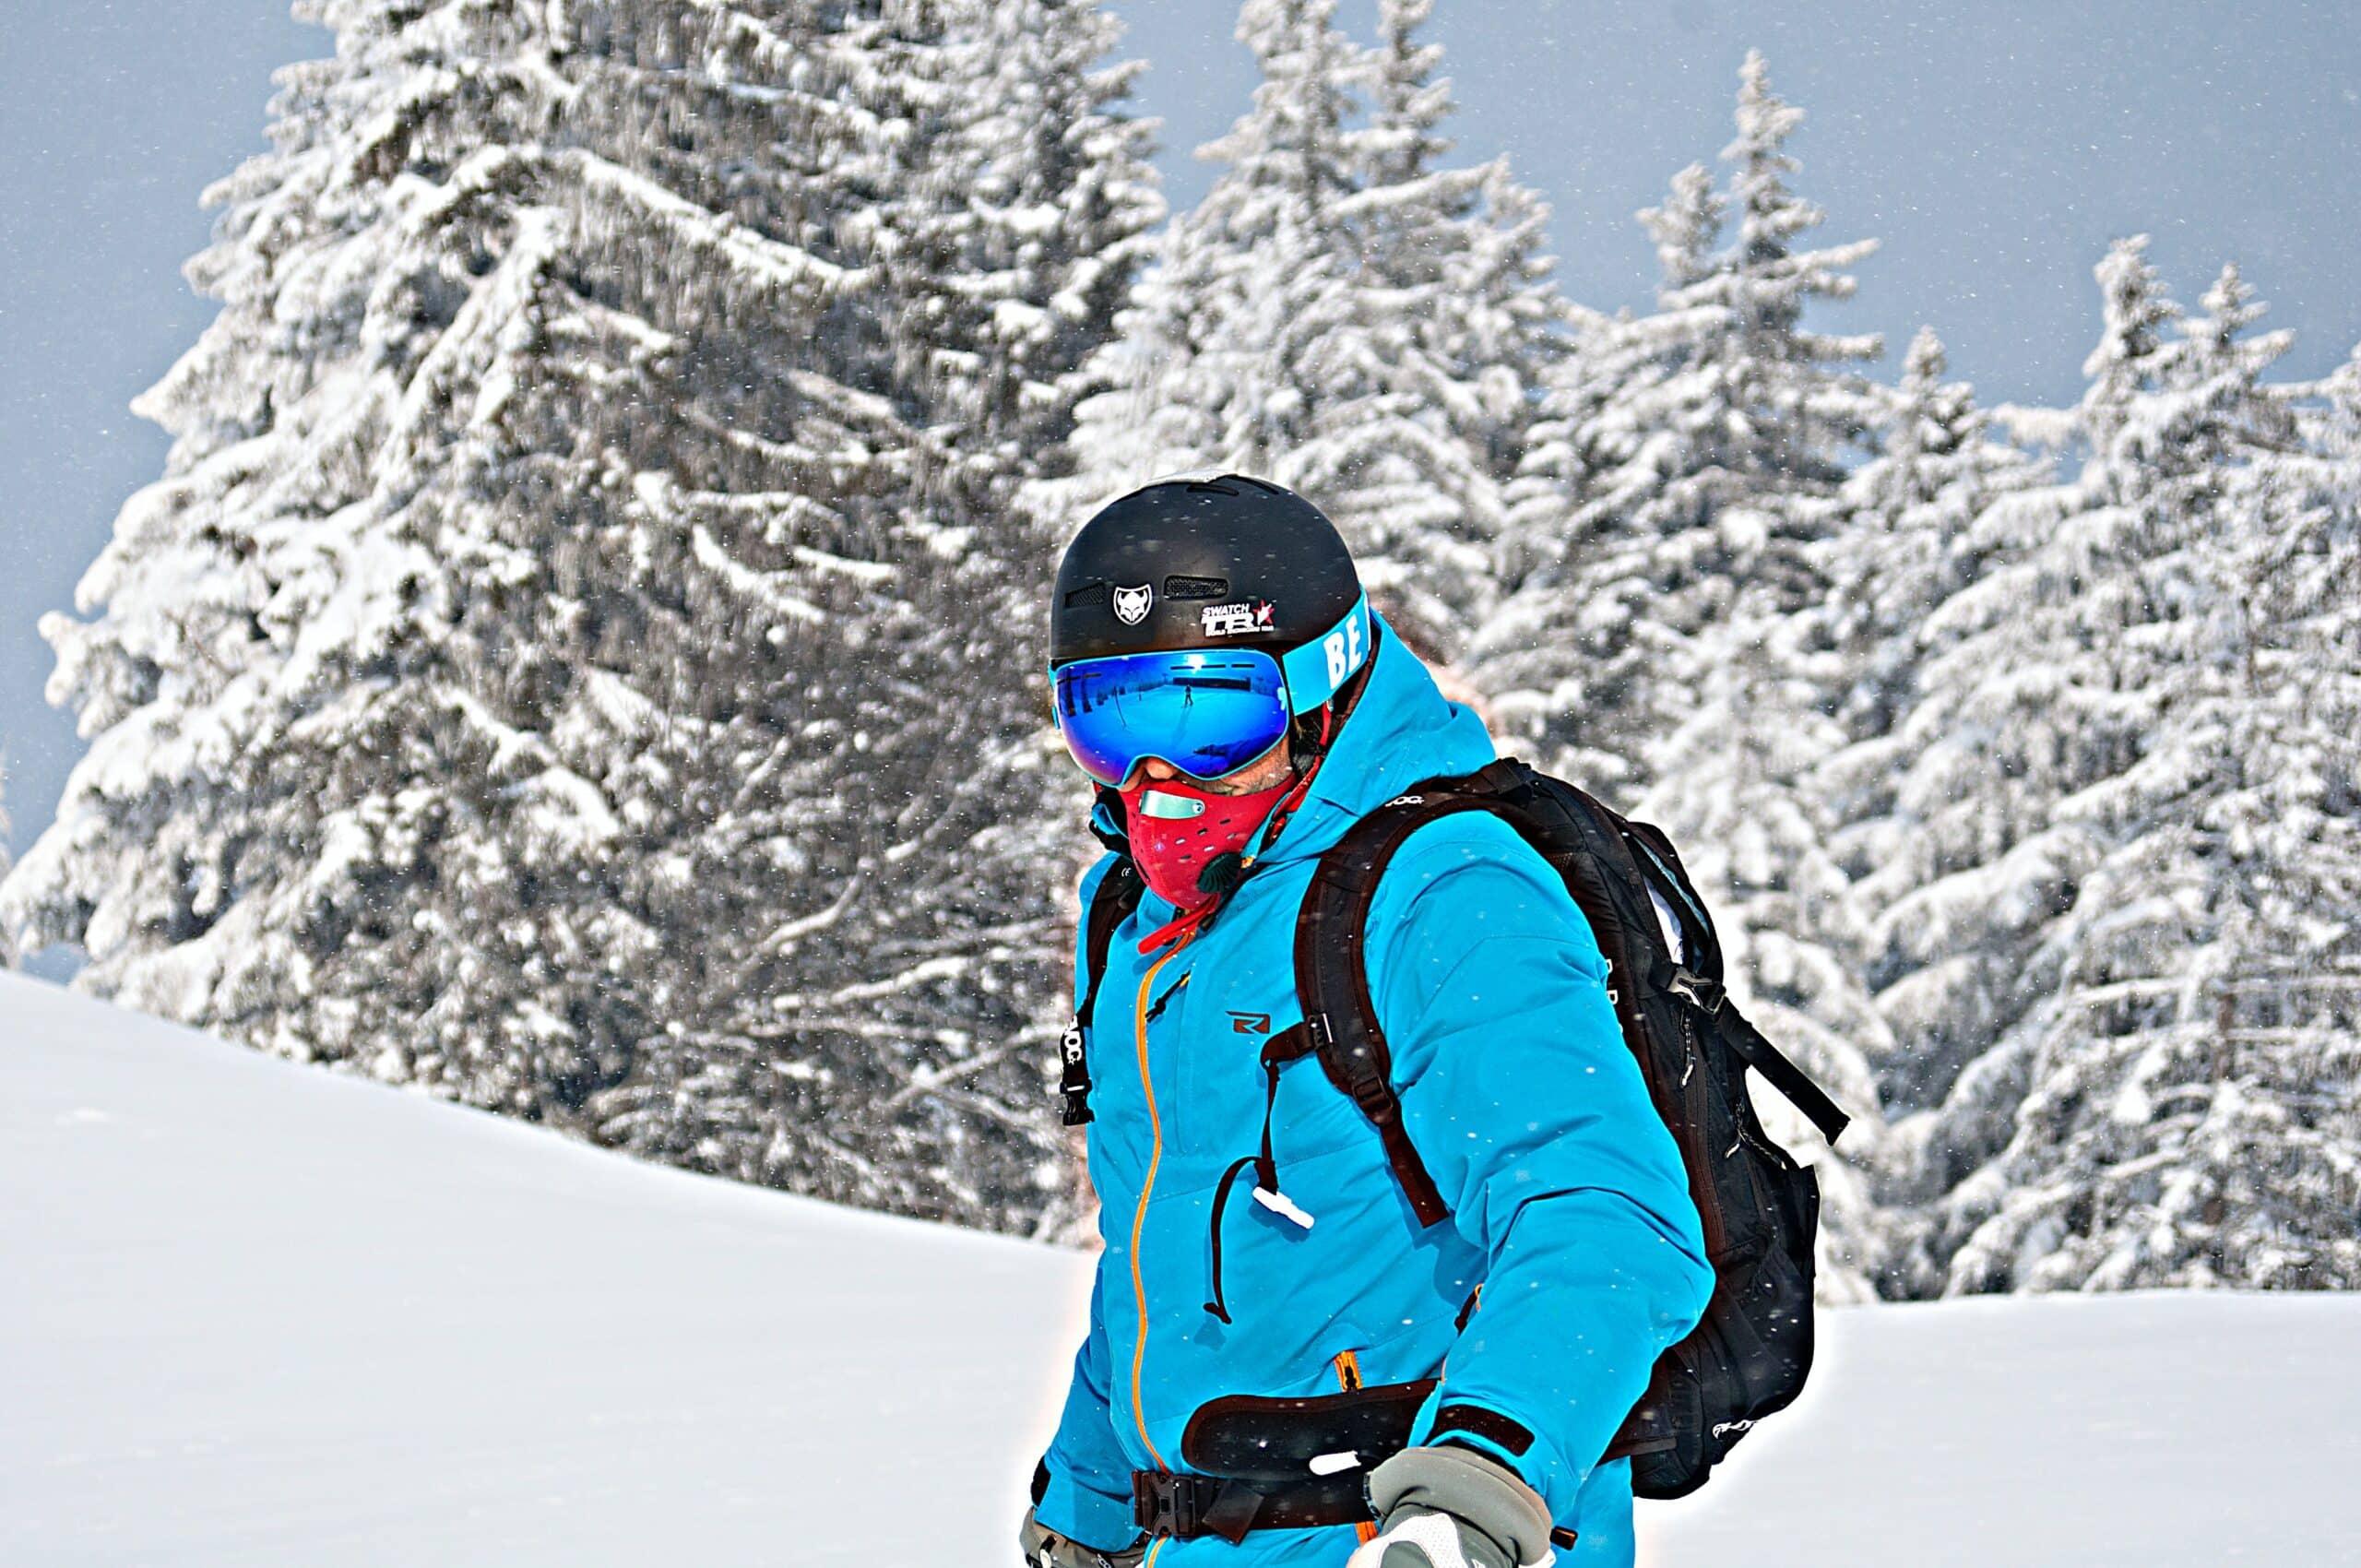 Skiier in OTG Goggles